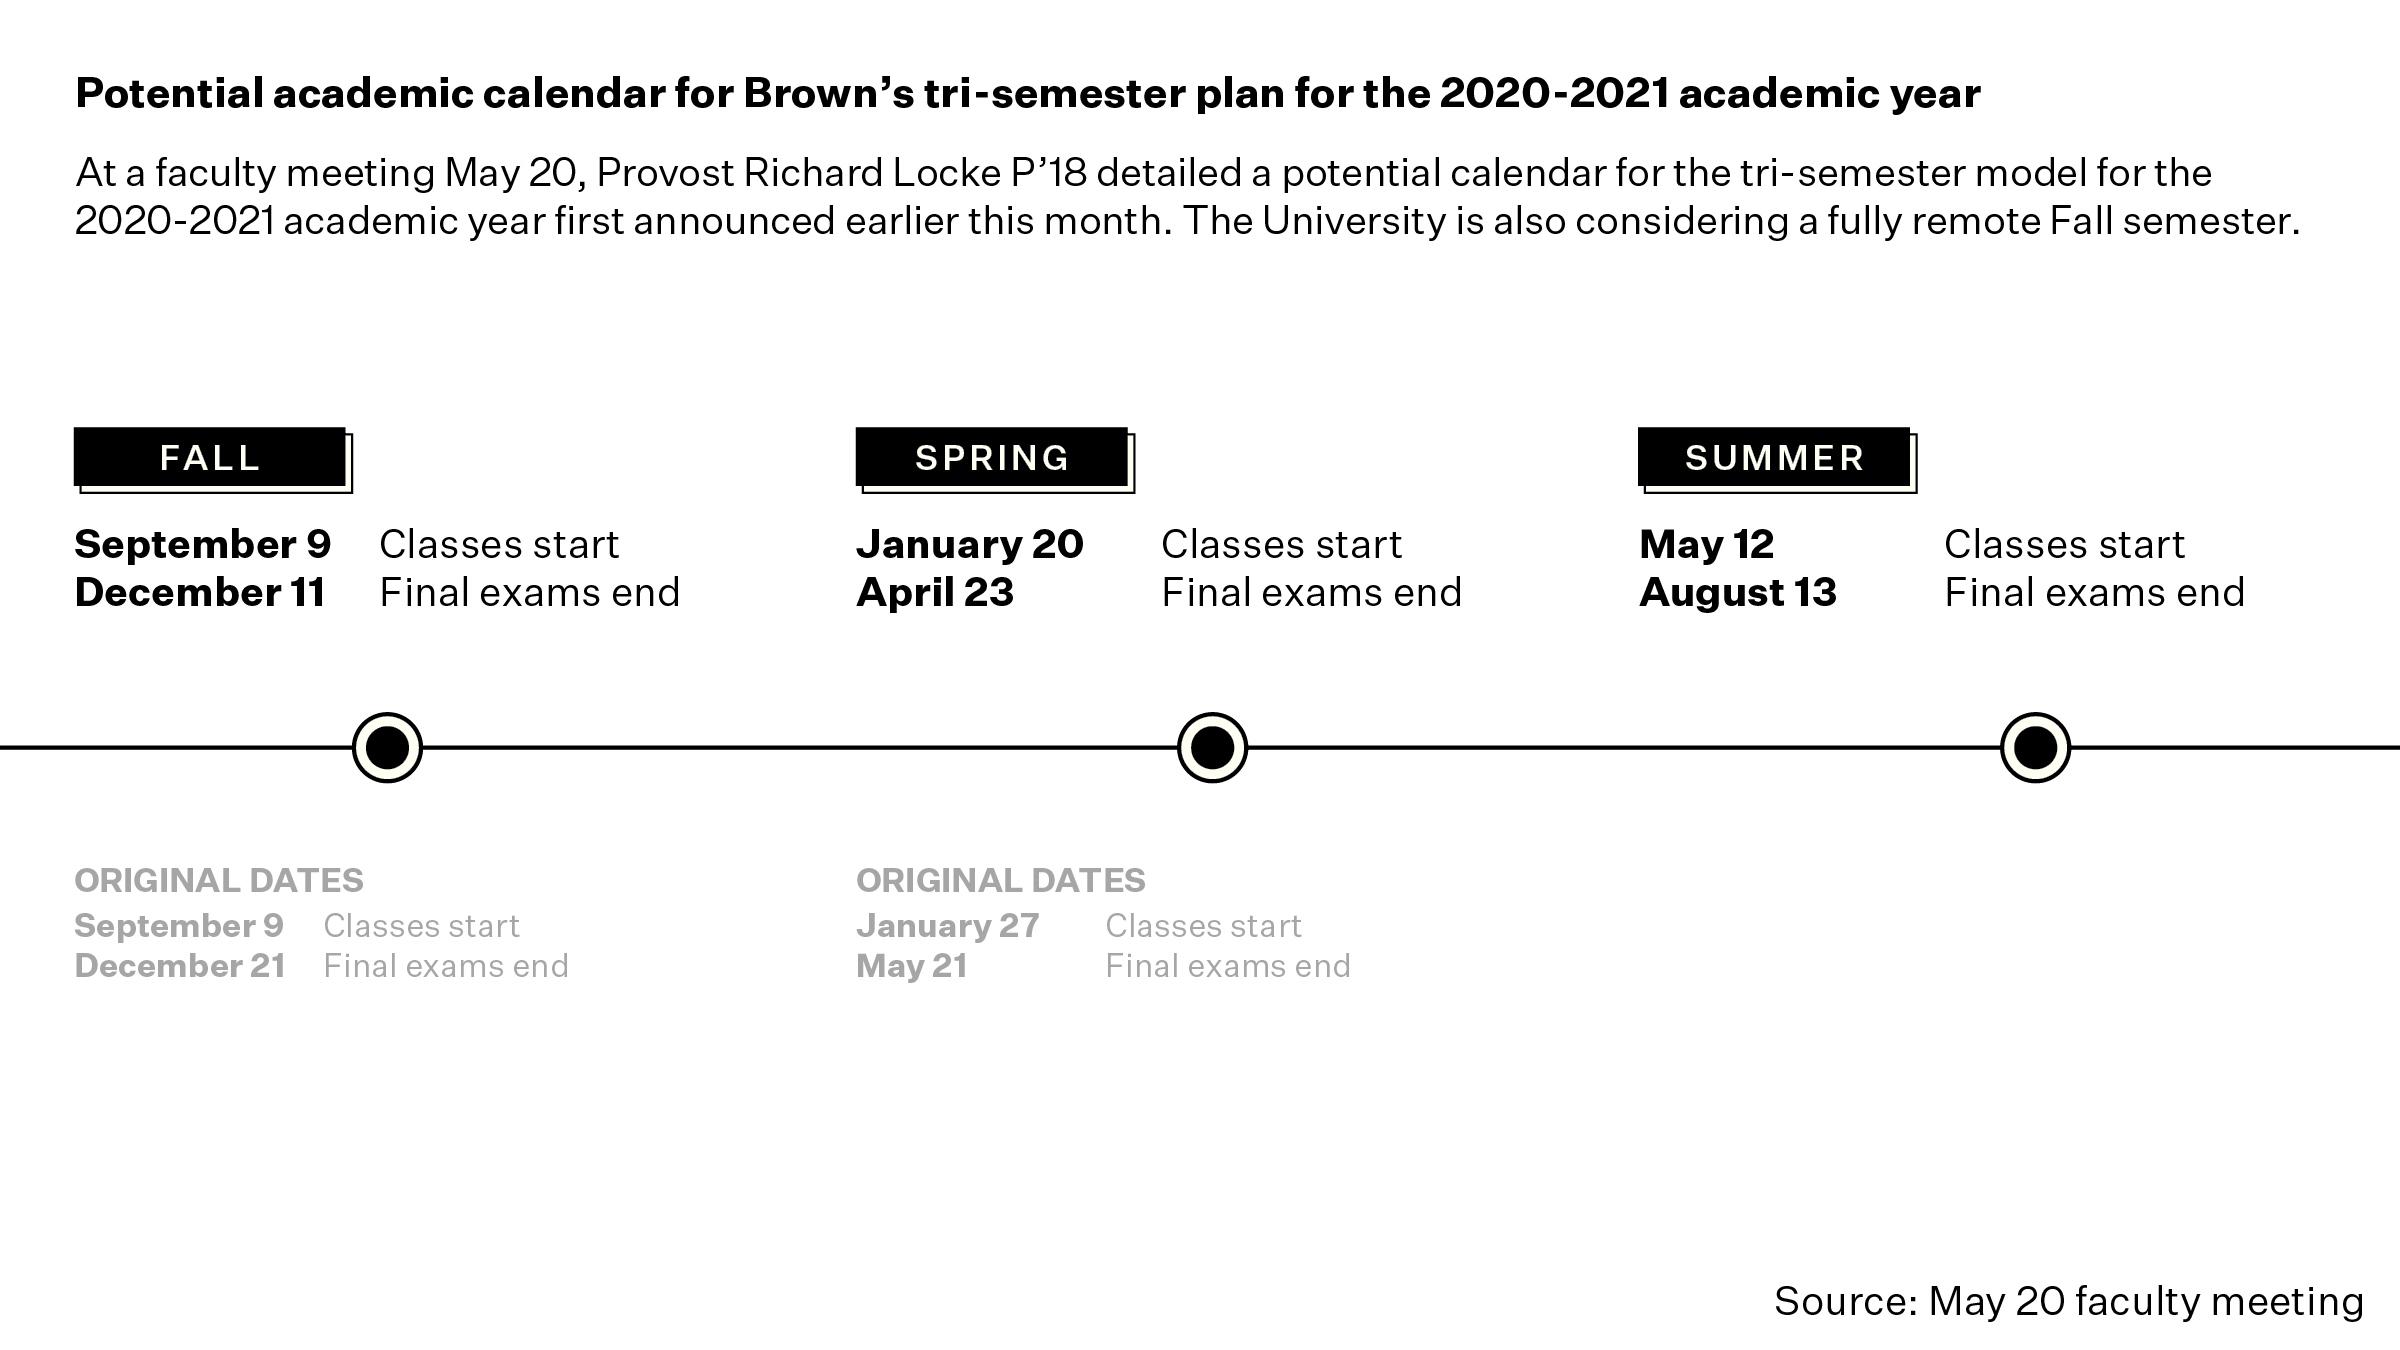 No Spring Break, Shorter Terms: Brown Outlines Potential intended for University Of Rhode Island 2021 2020 Calendar